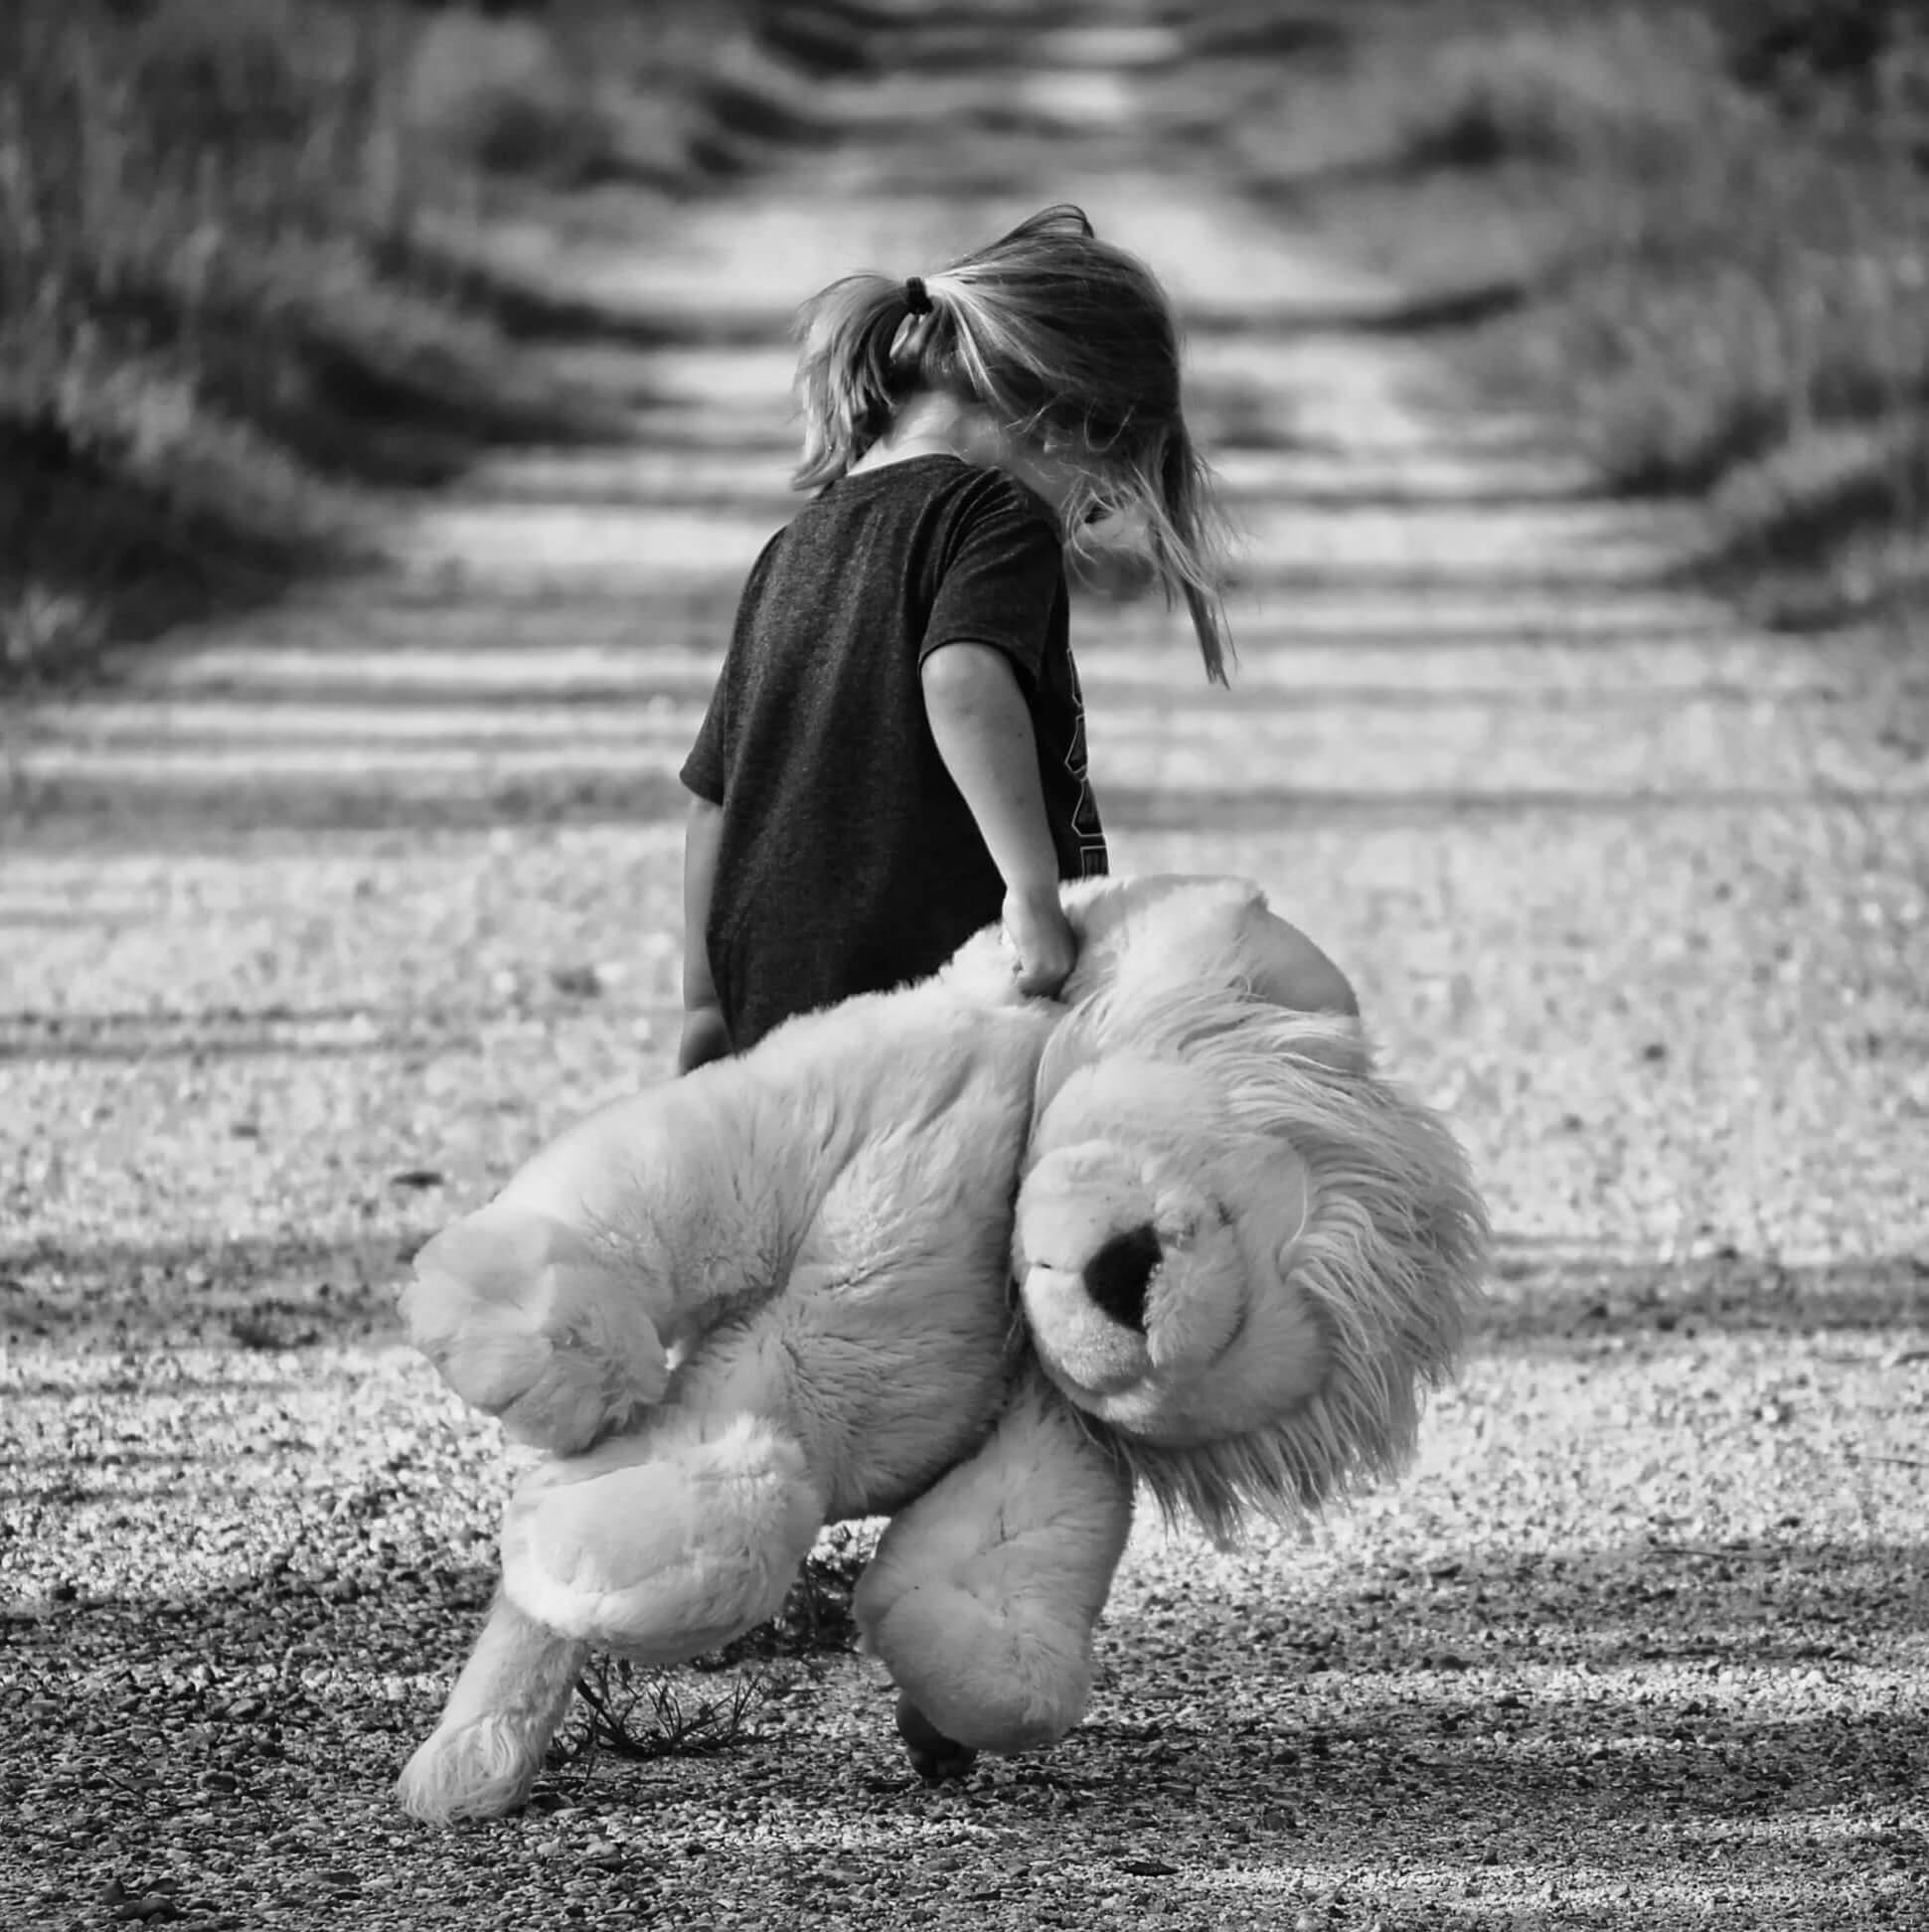 Early Maladaptive Schemas - Little Girl Holding Teddy Bear On a Road